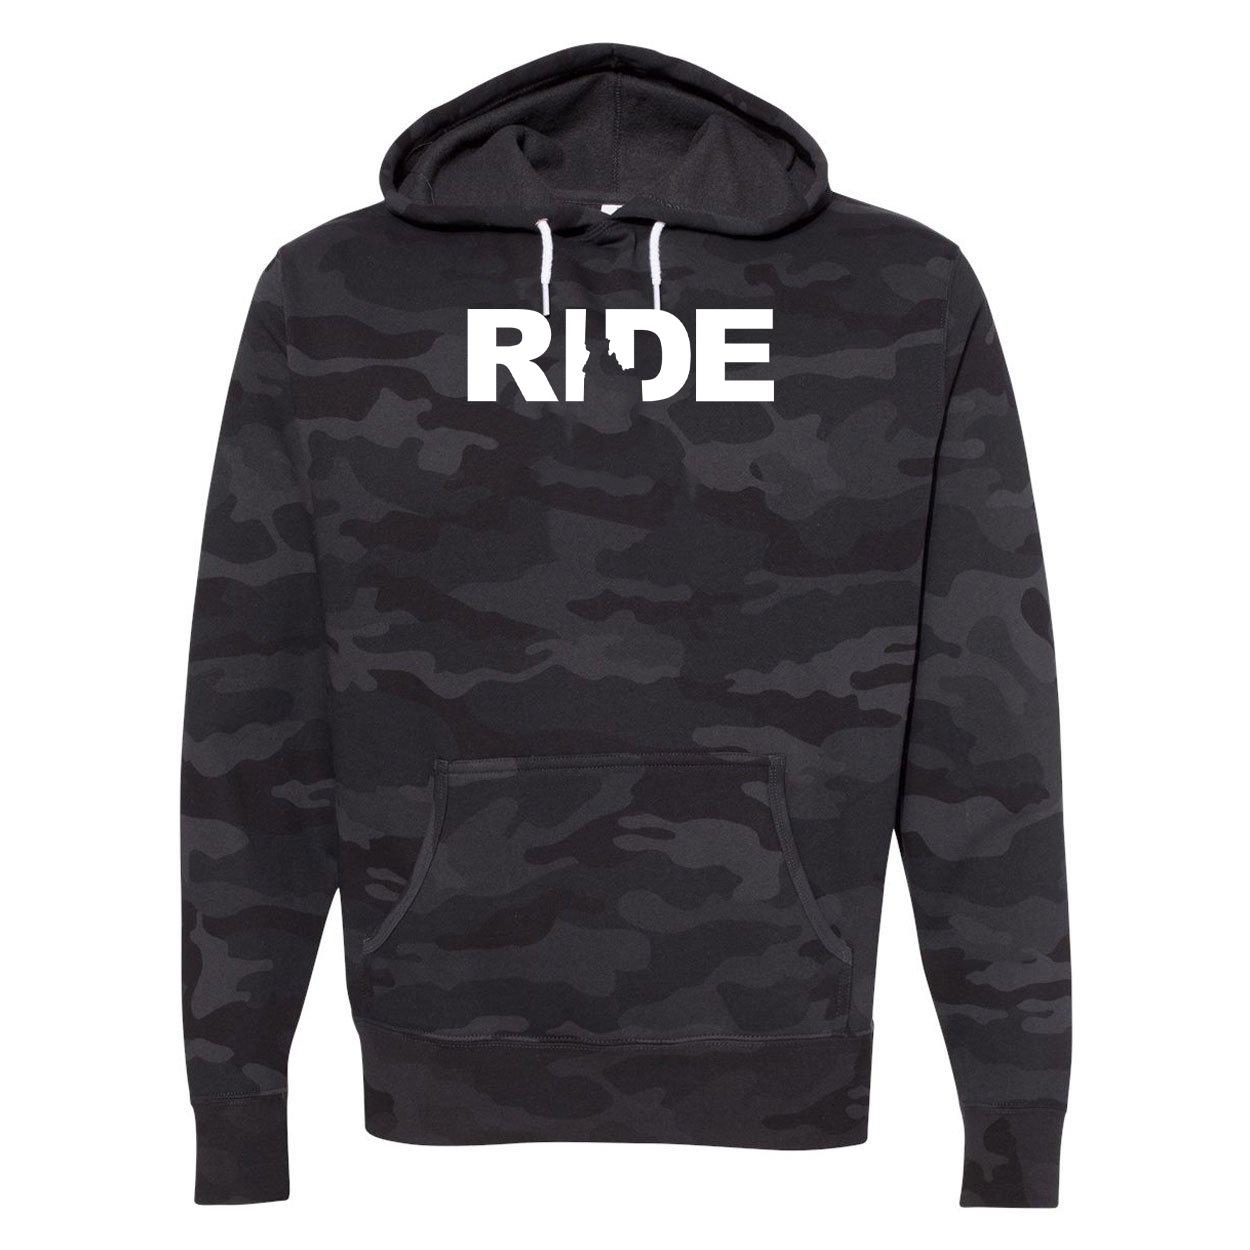 Ride Idaho Classic Unisex Hooded Sweatshirt Black Camo (White Logo)